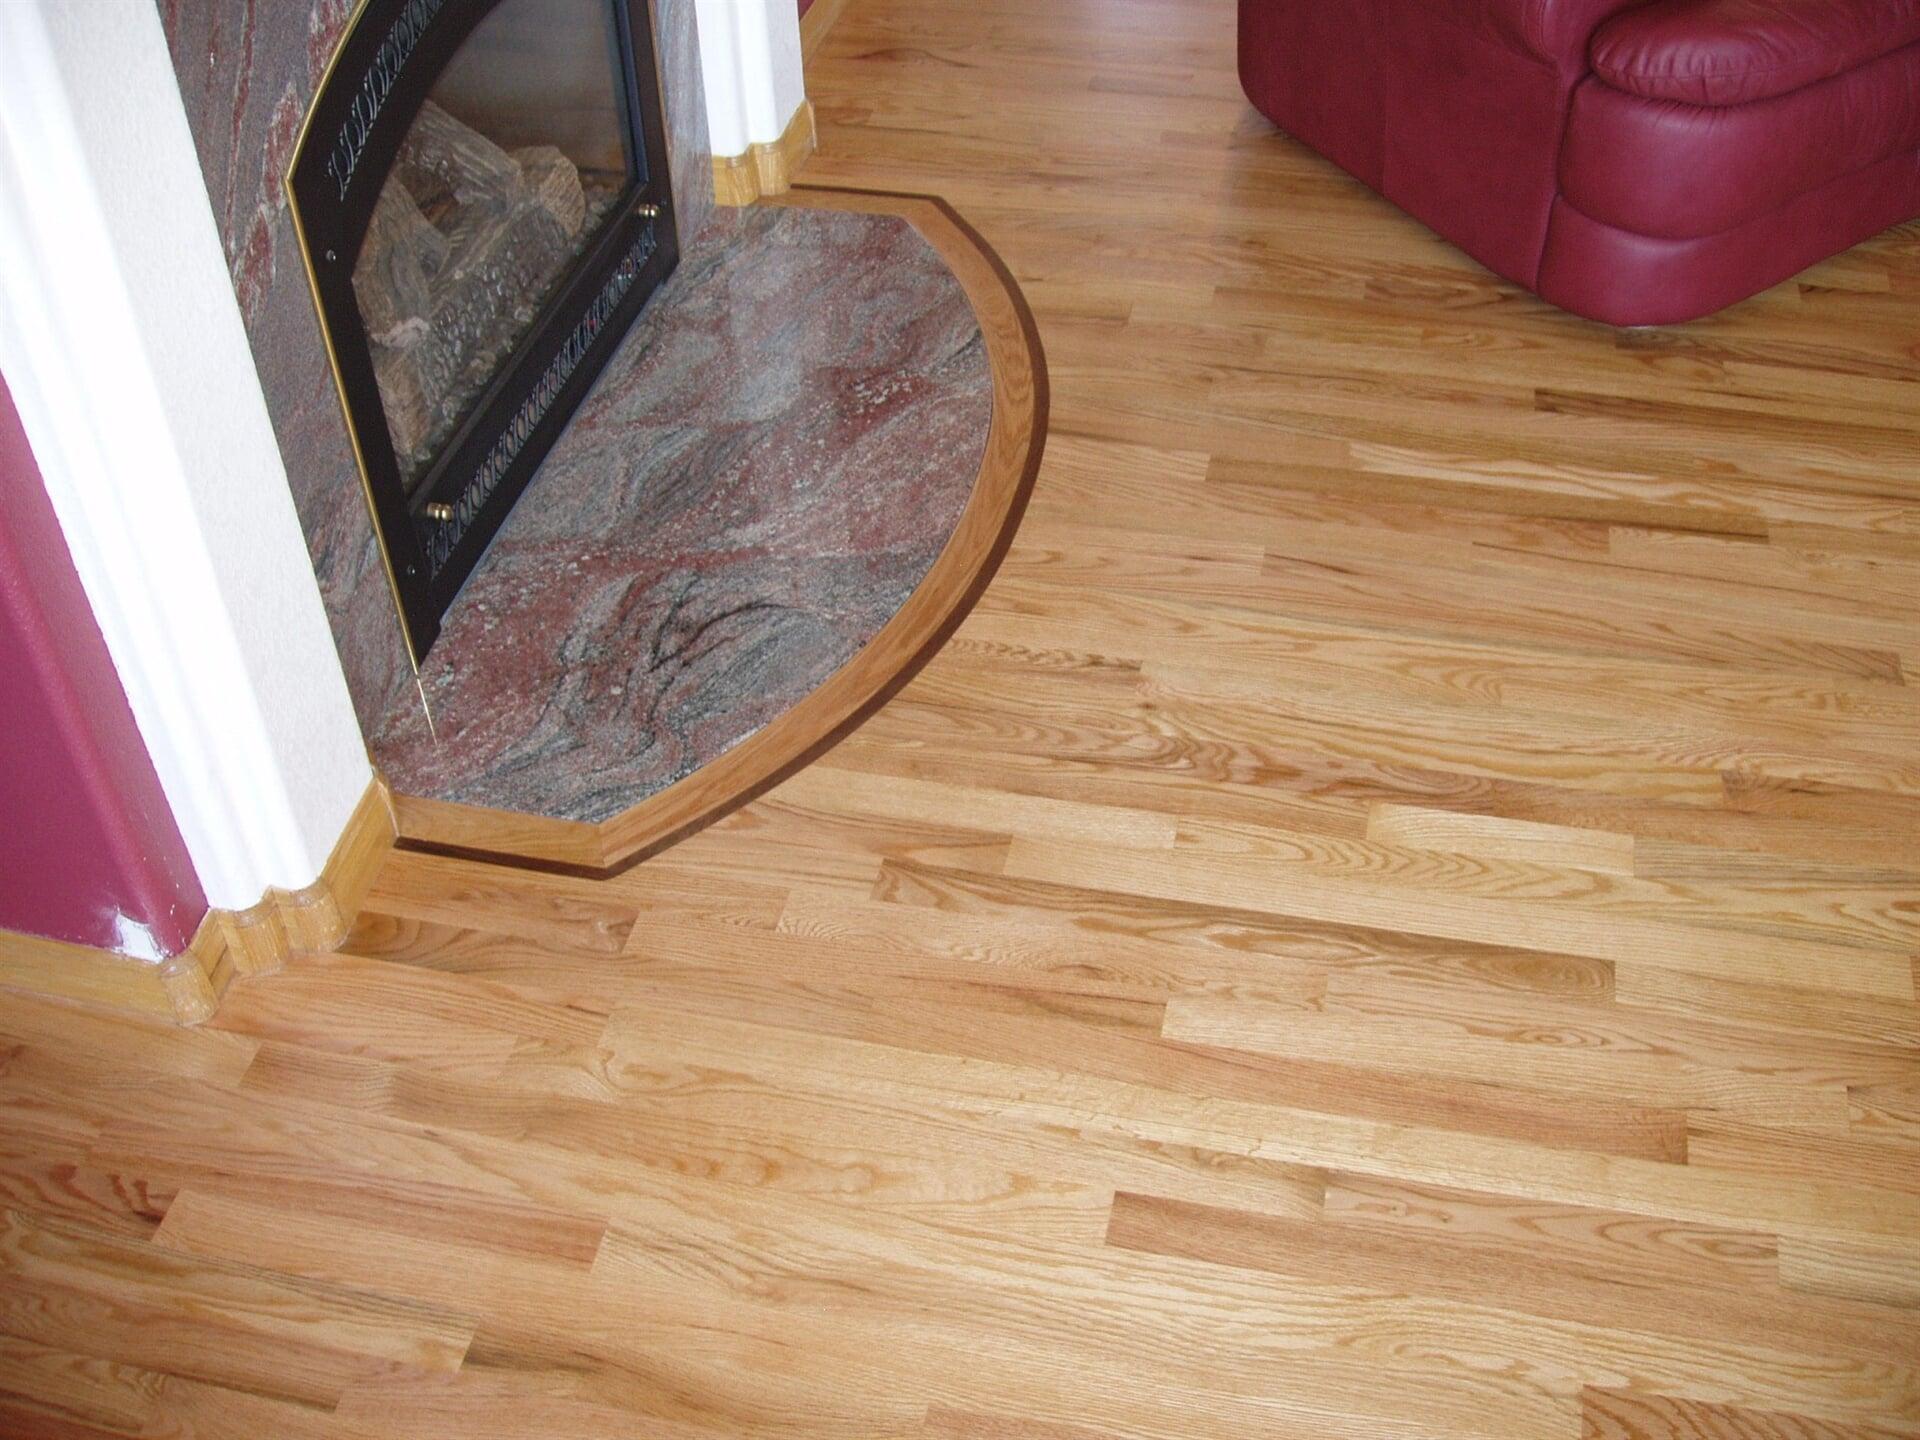 Hardwood flooring at Schmidt Custom Floors in Estes Park, CO